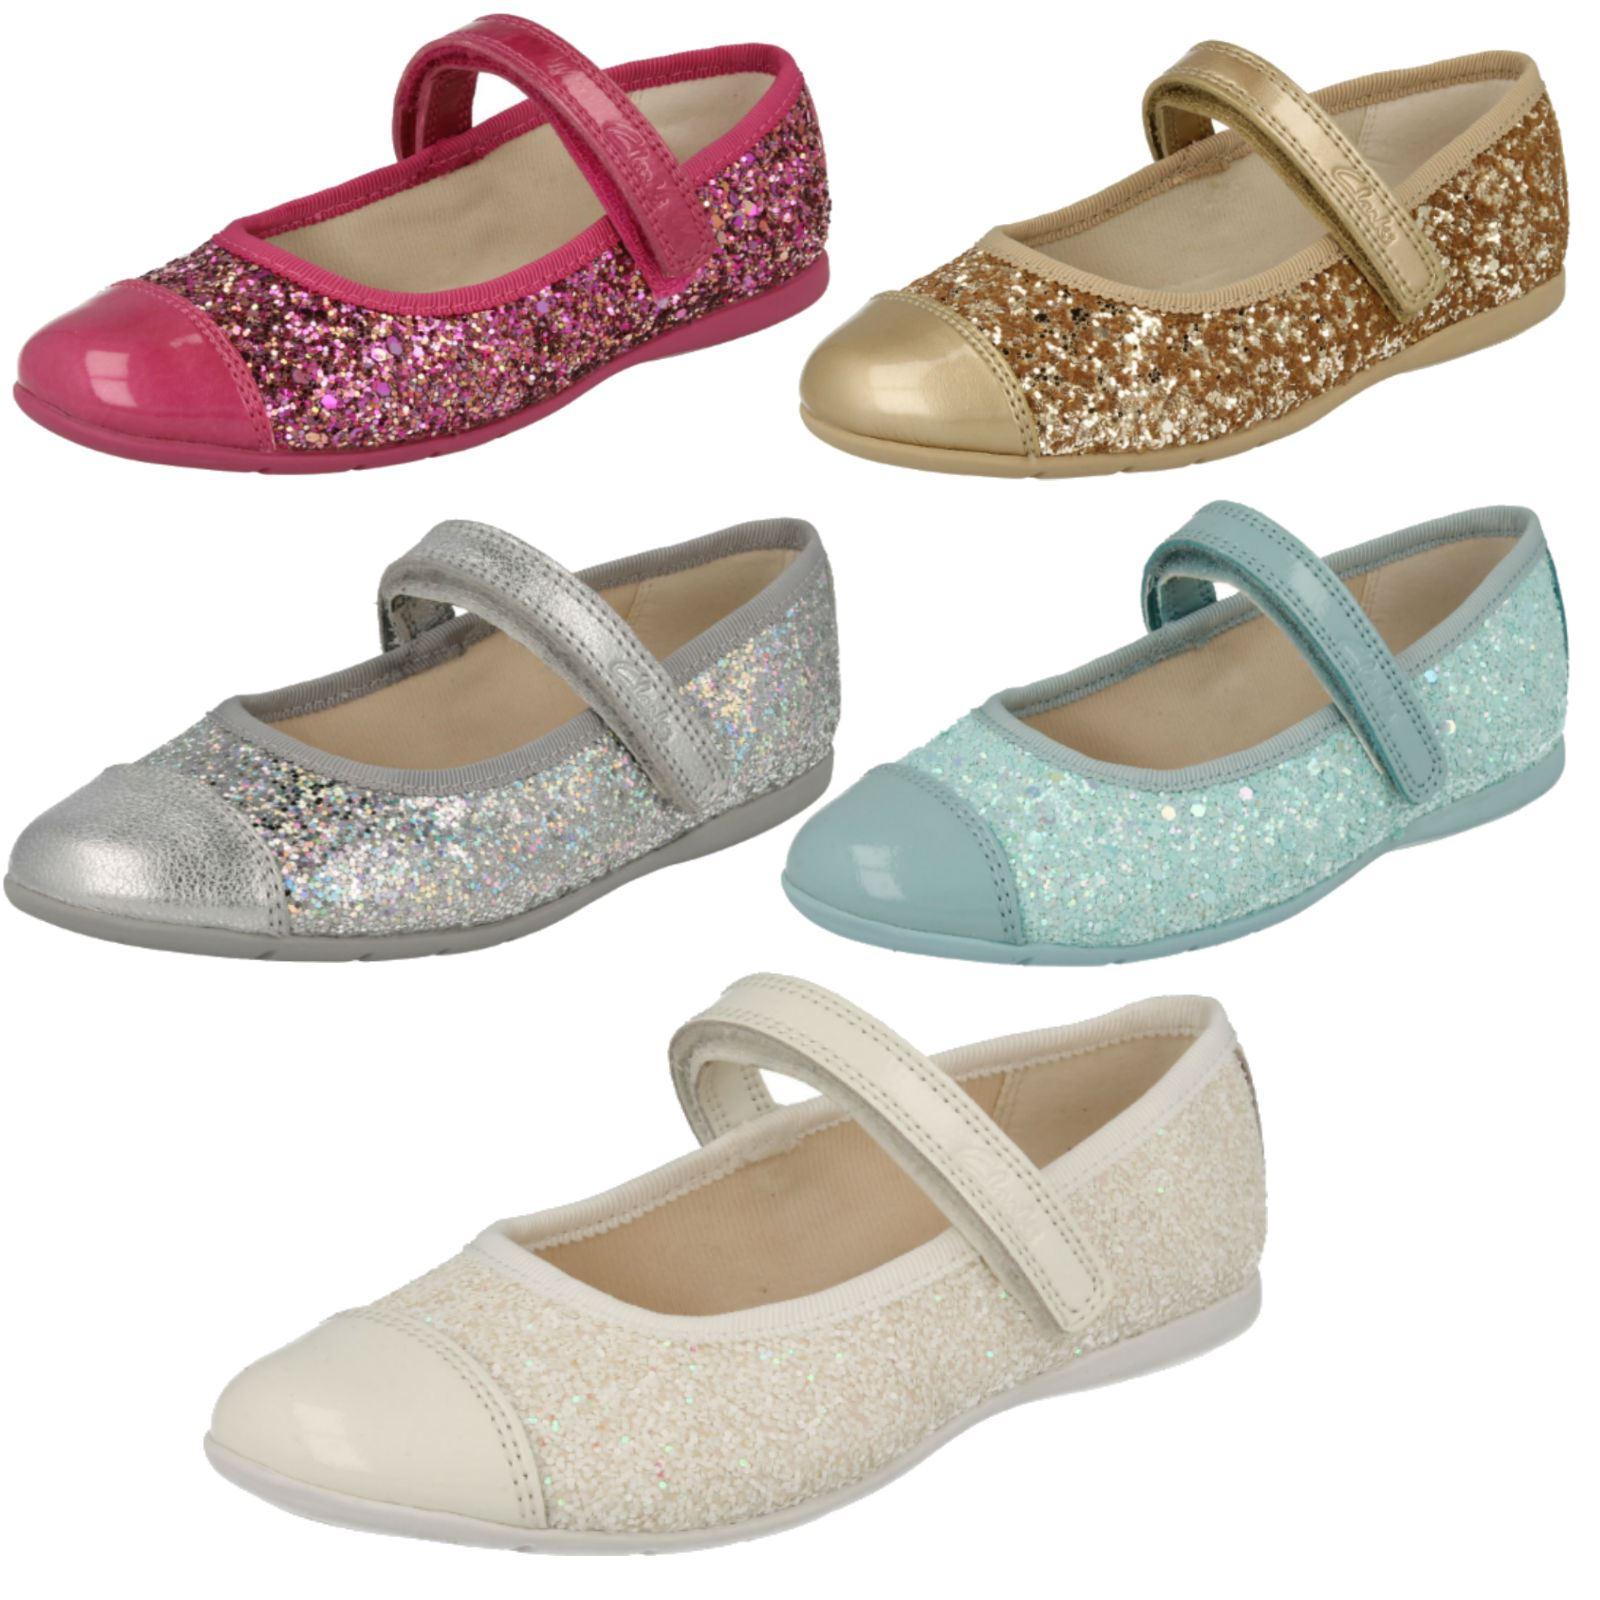 95d7288a Infantiles niñas Clarks gancho y bucle Mary Jane estilo Glitter ídolo de  danza zapatos de fiesta